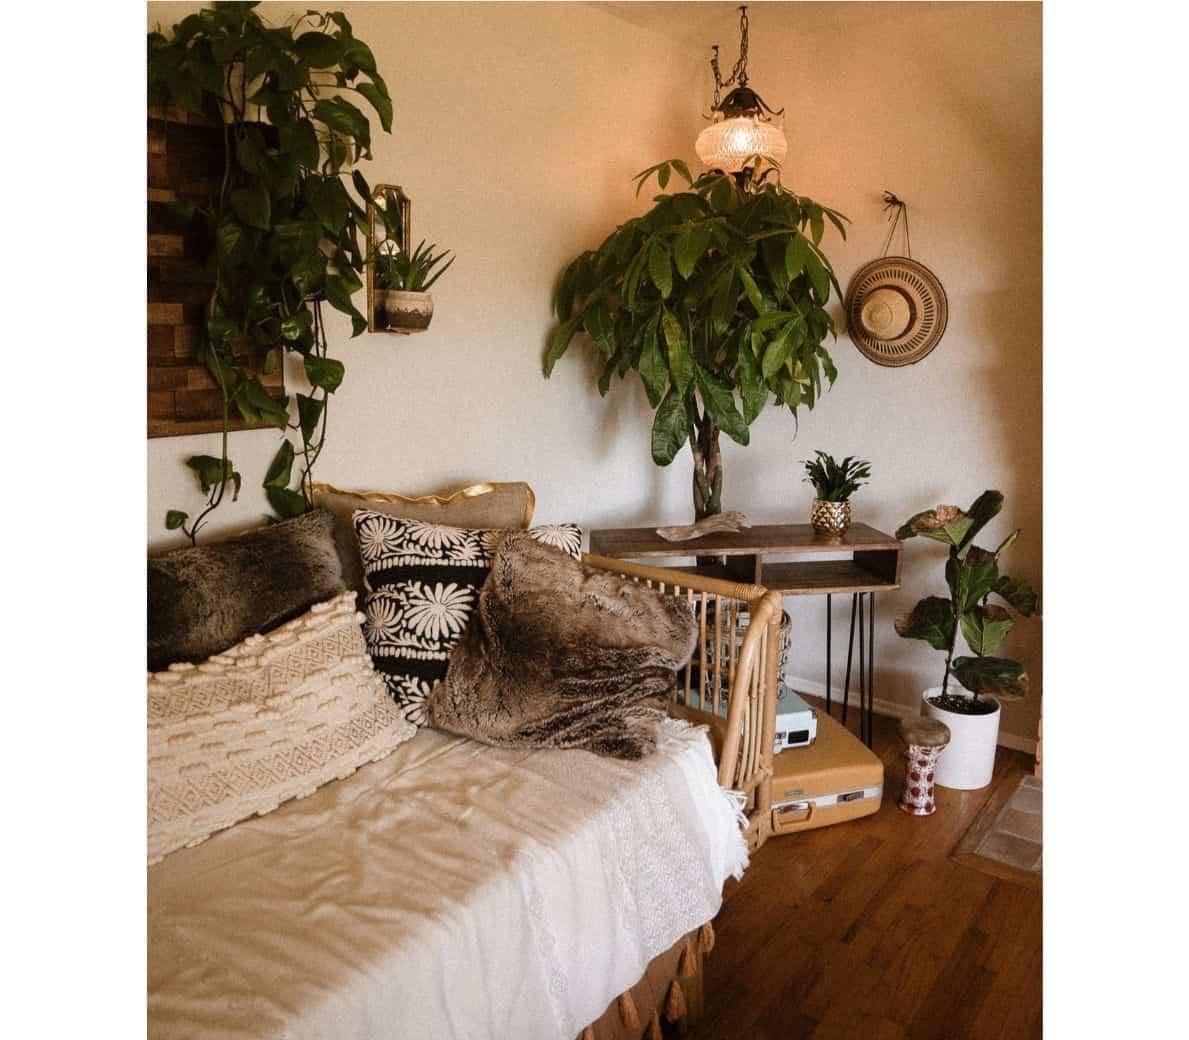 log-cabin-interior-design-2-bohemian-design